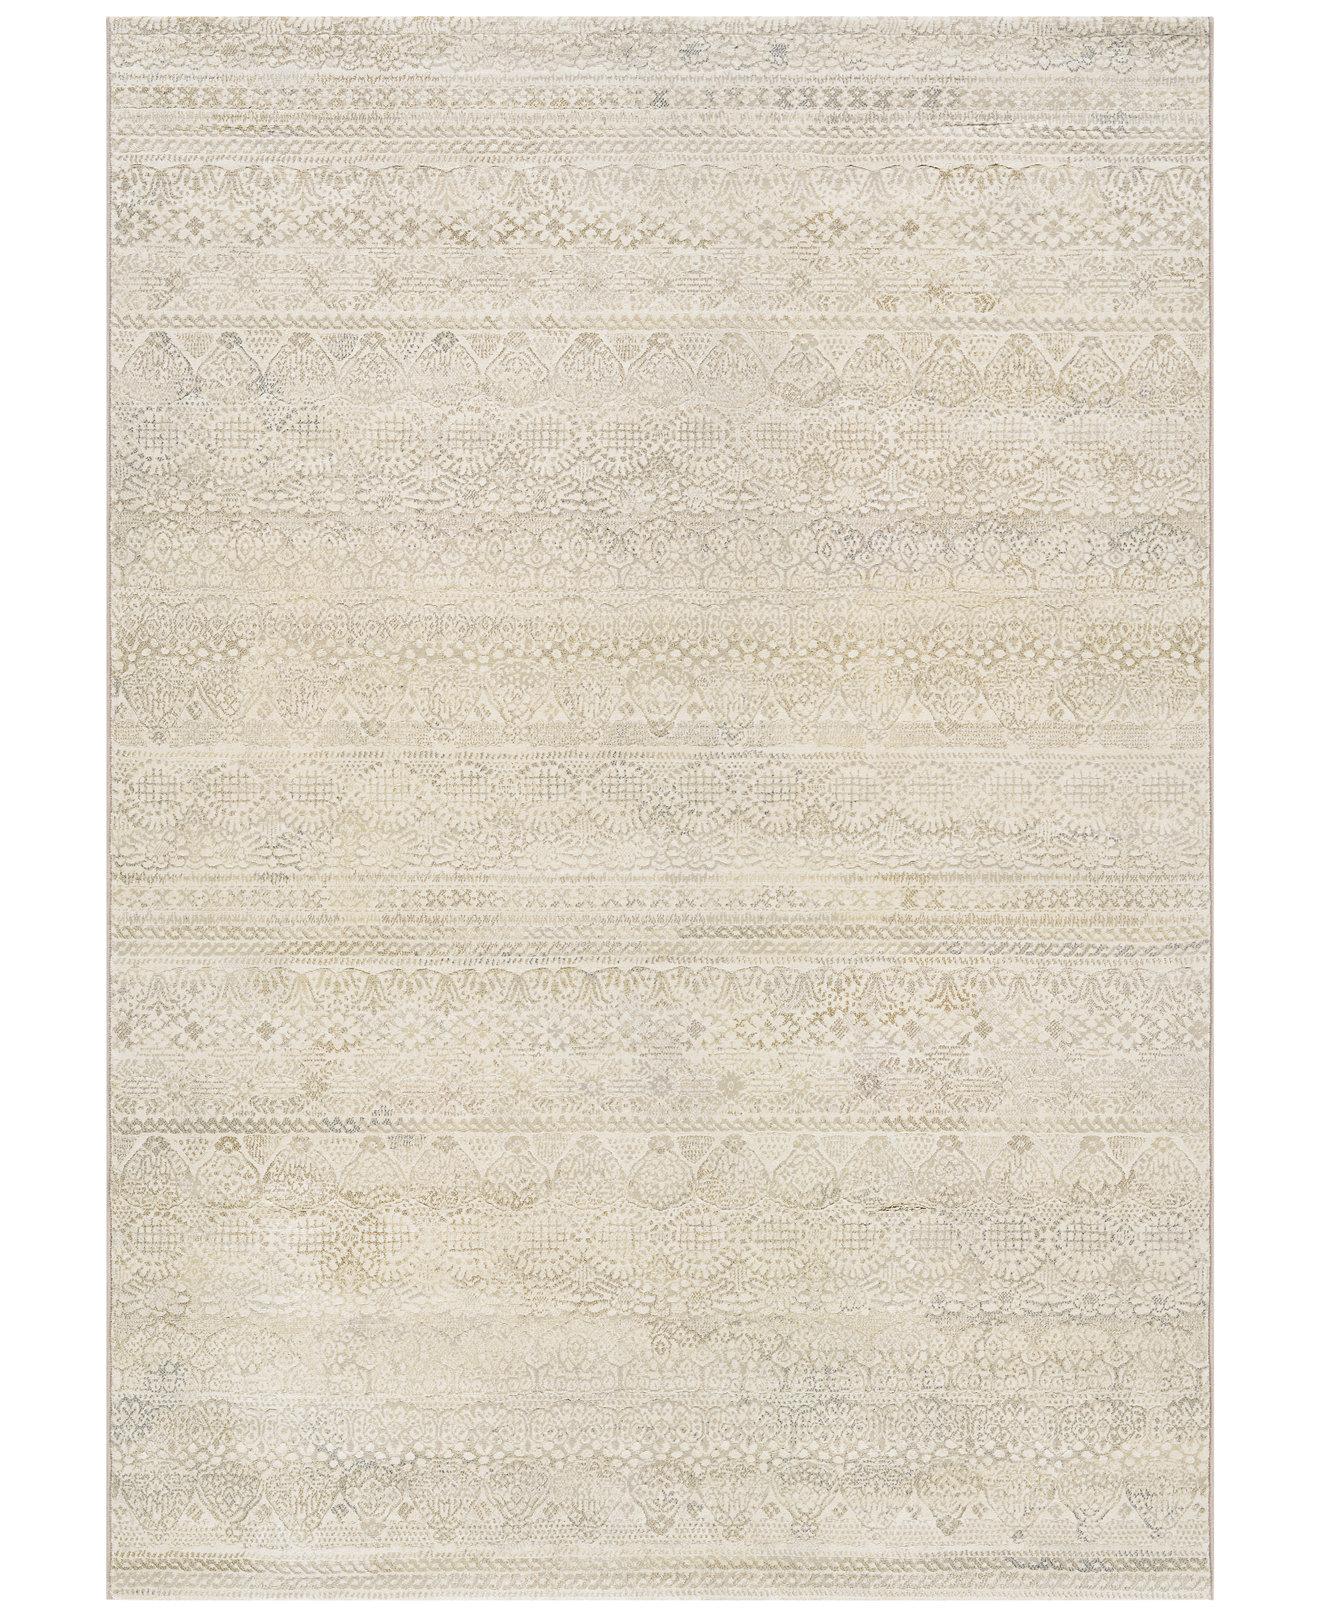 white rugs  macy's - couristan taylor capella ' x ' area rug